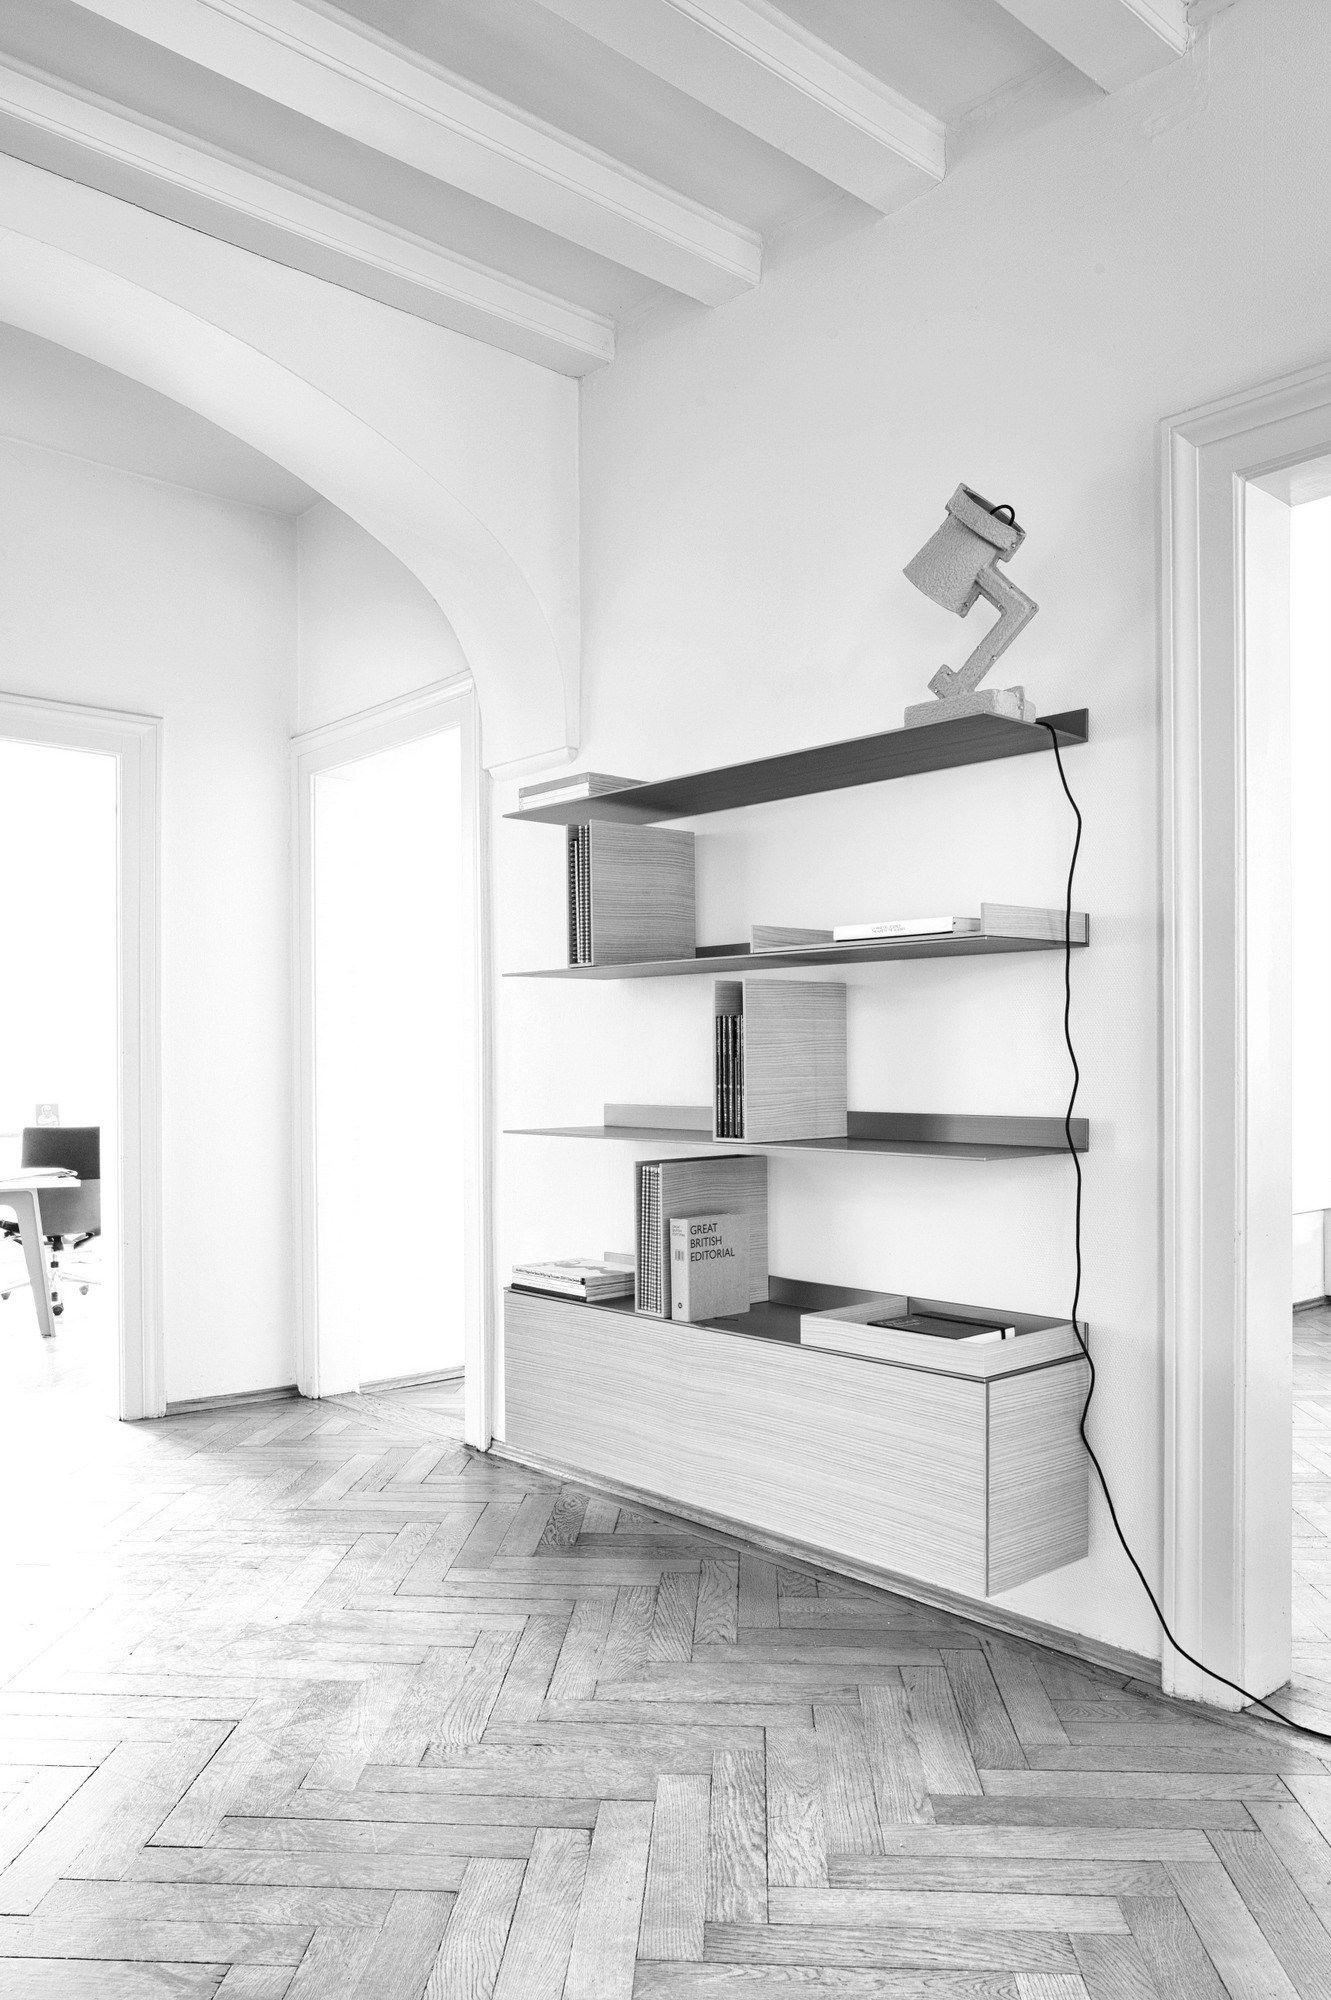 S7 regalsystem by schönbuch design dante bonuccelli